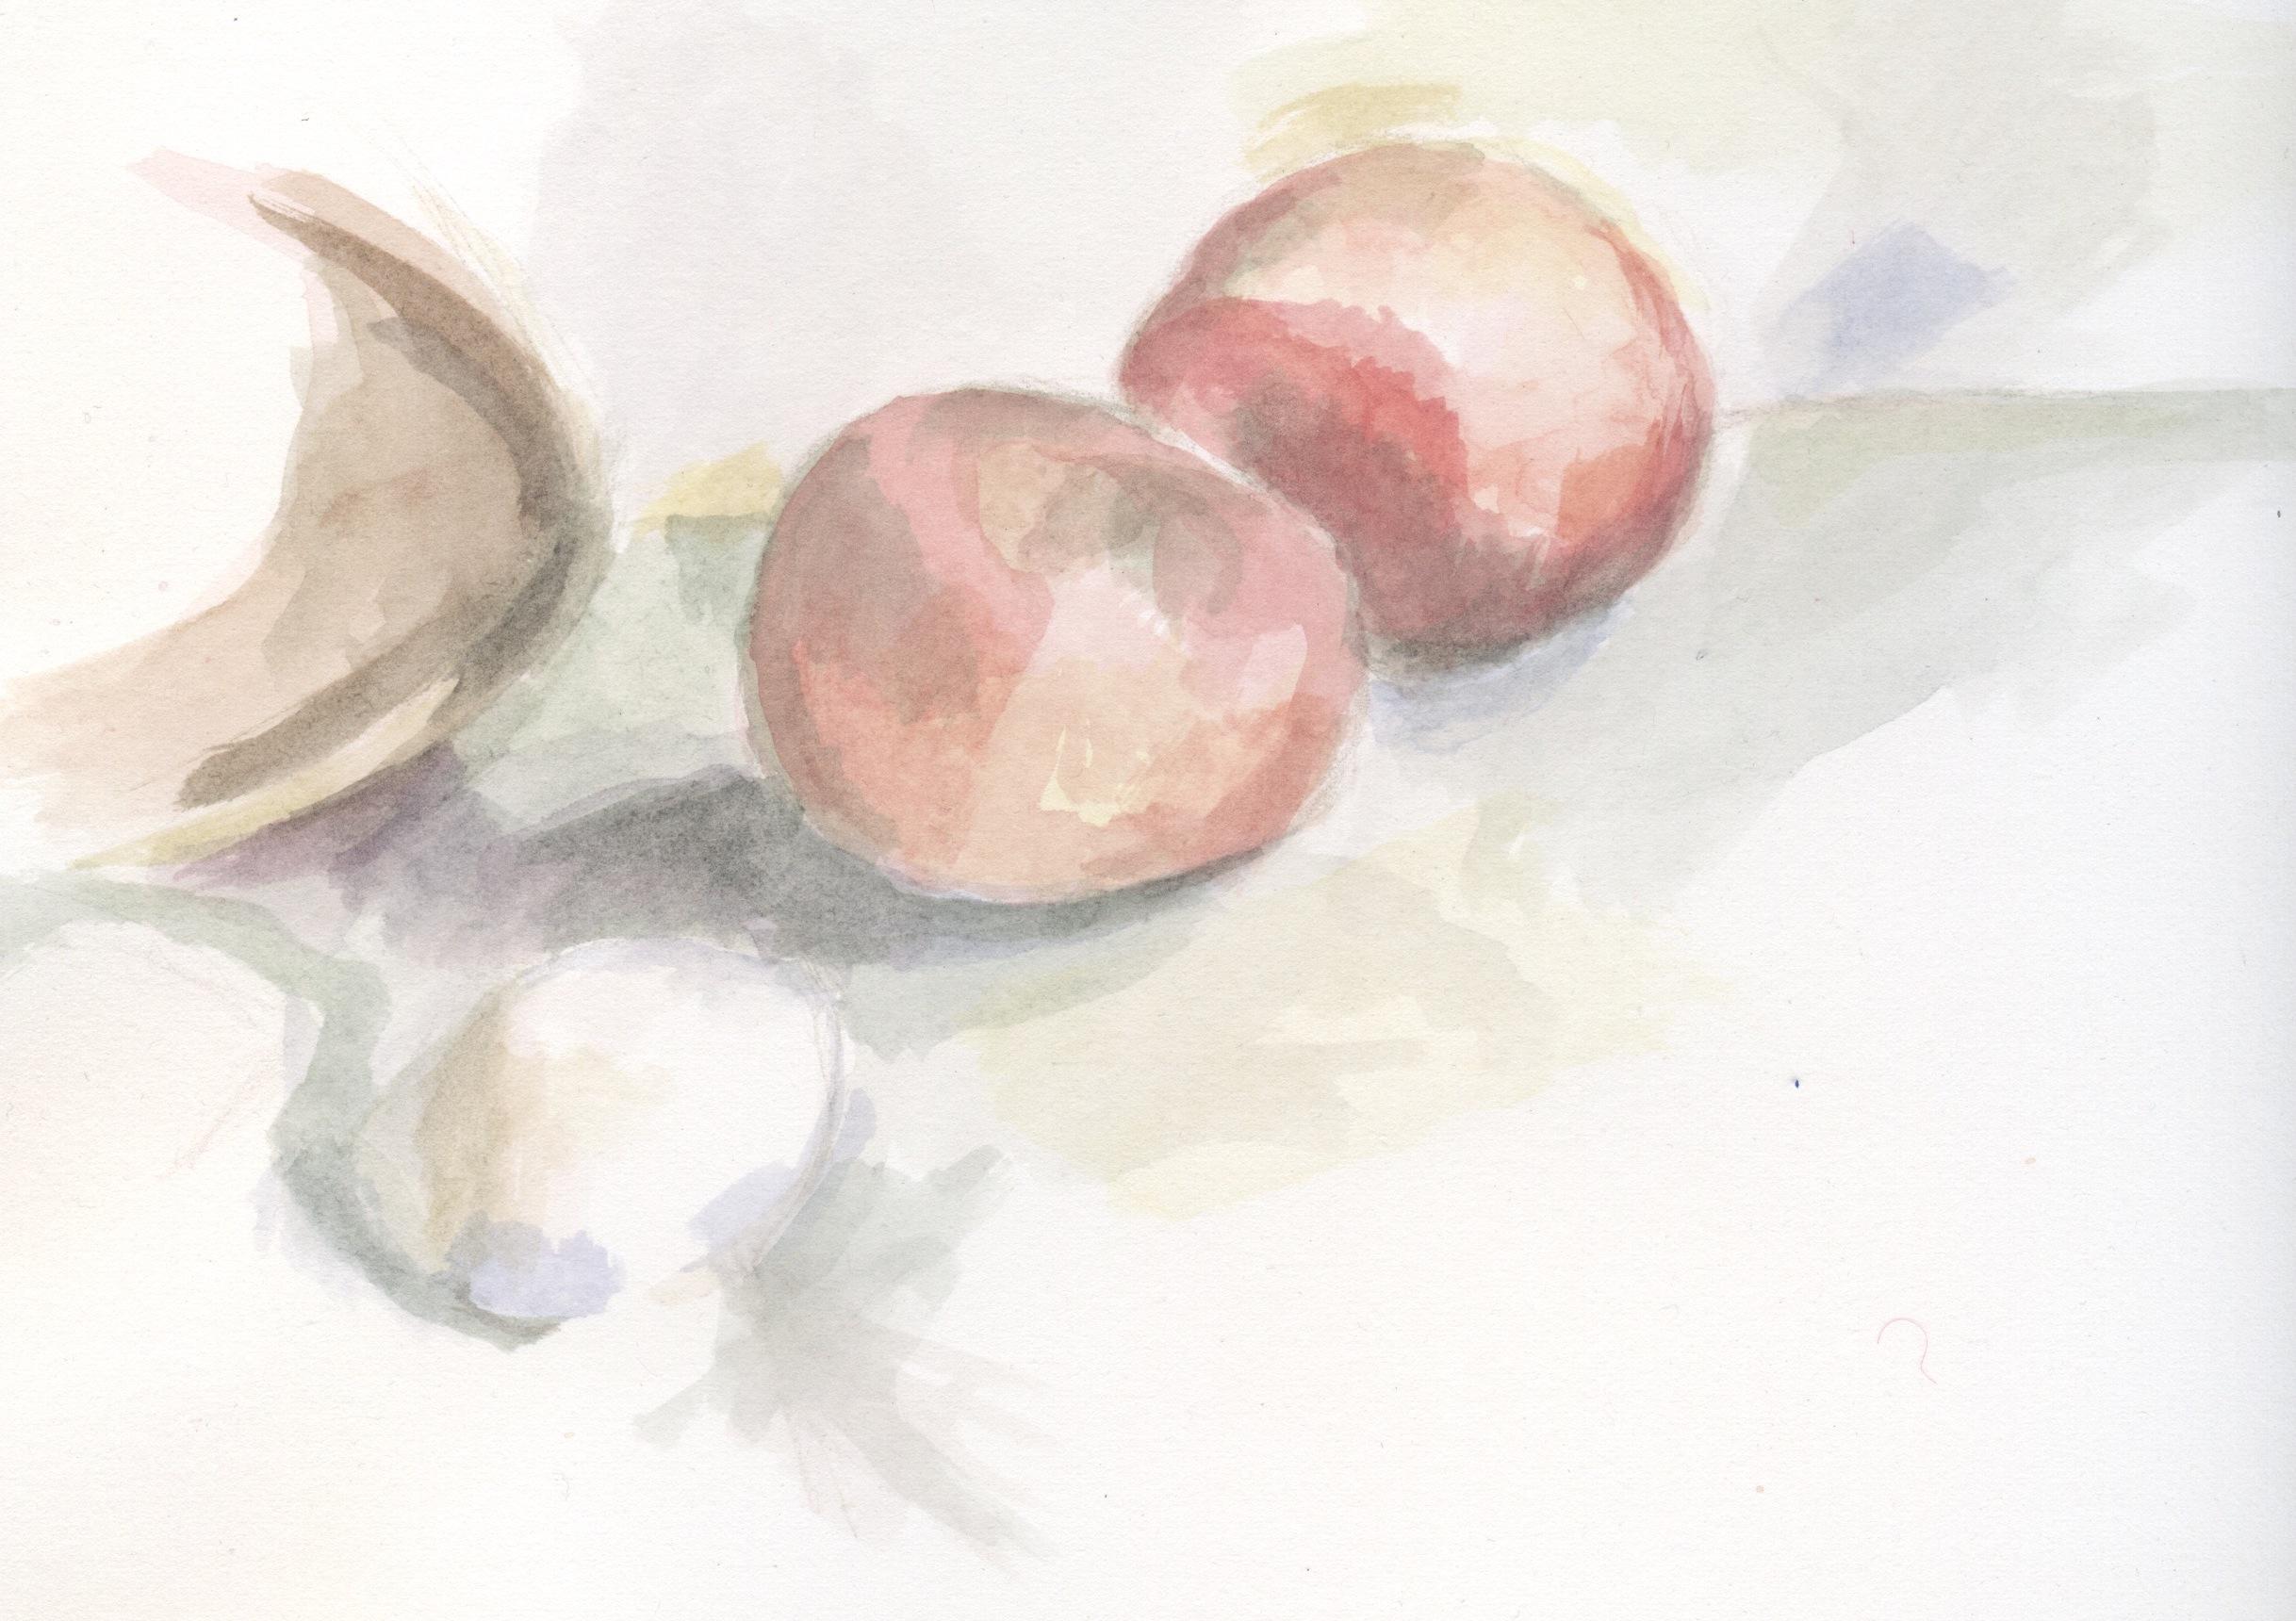 sally's peaches